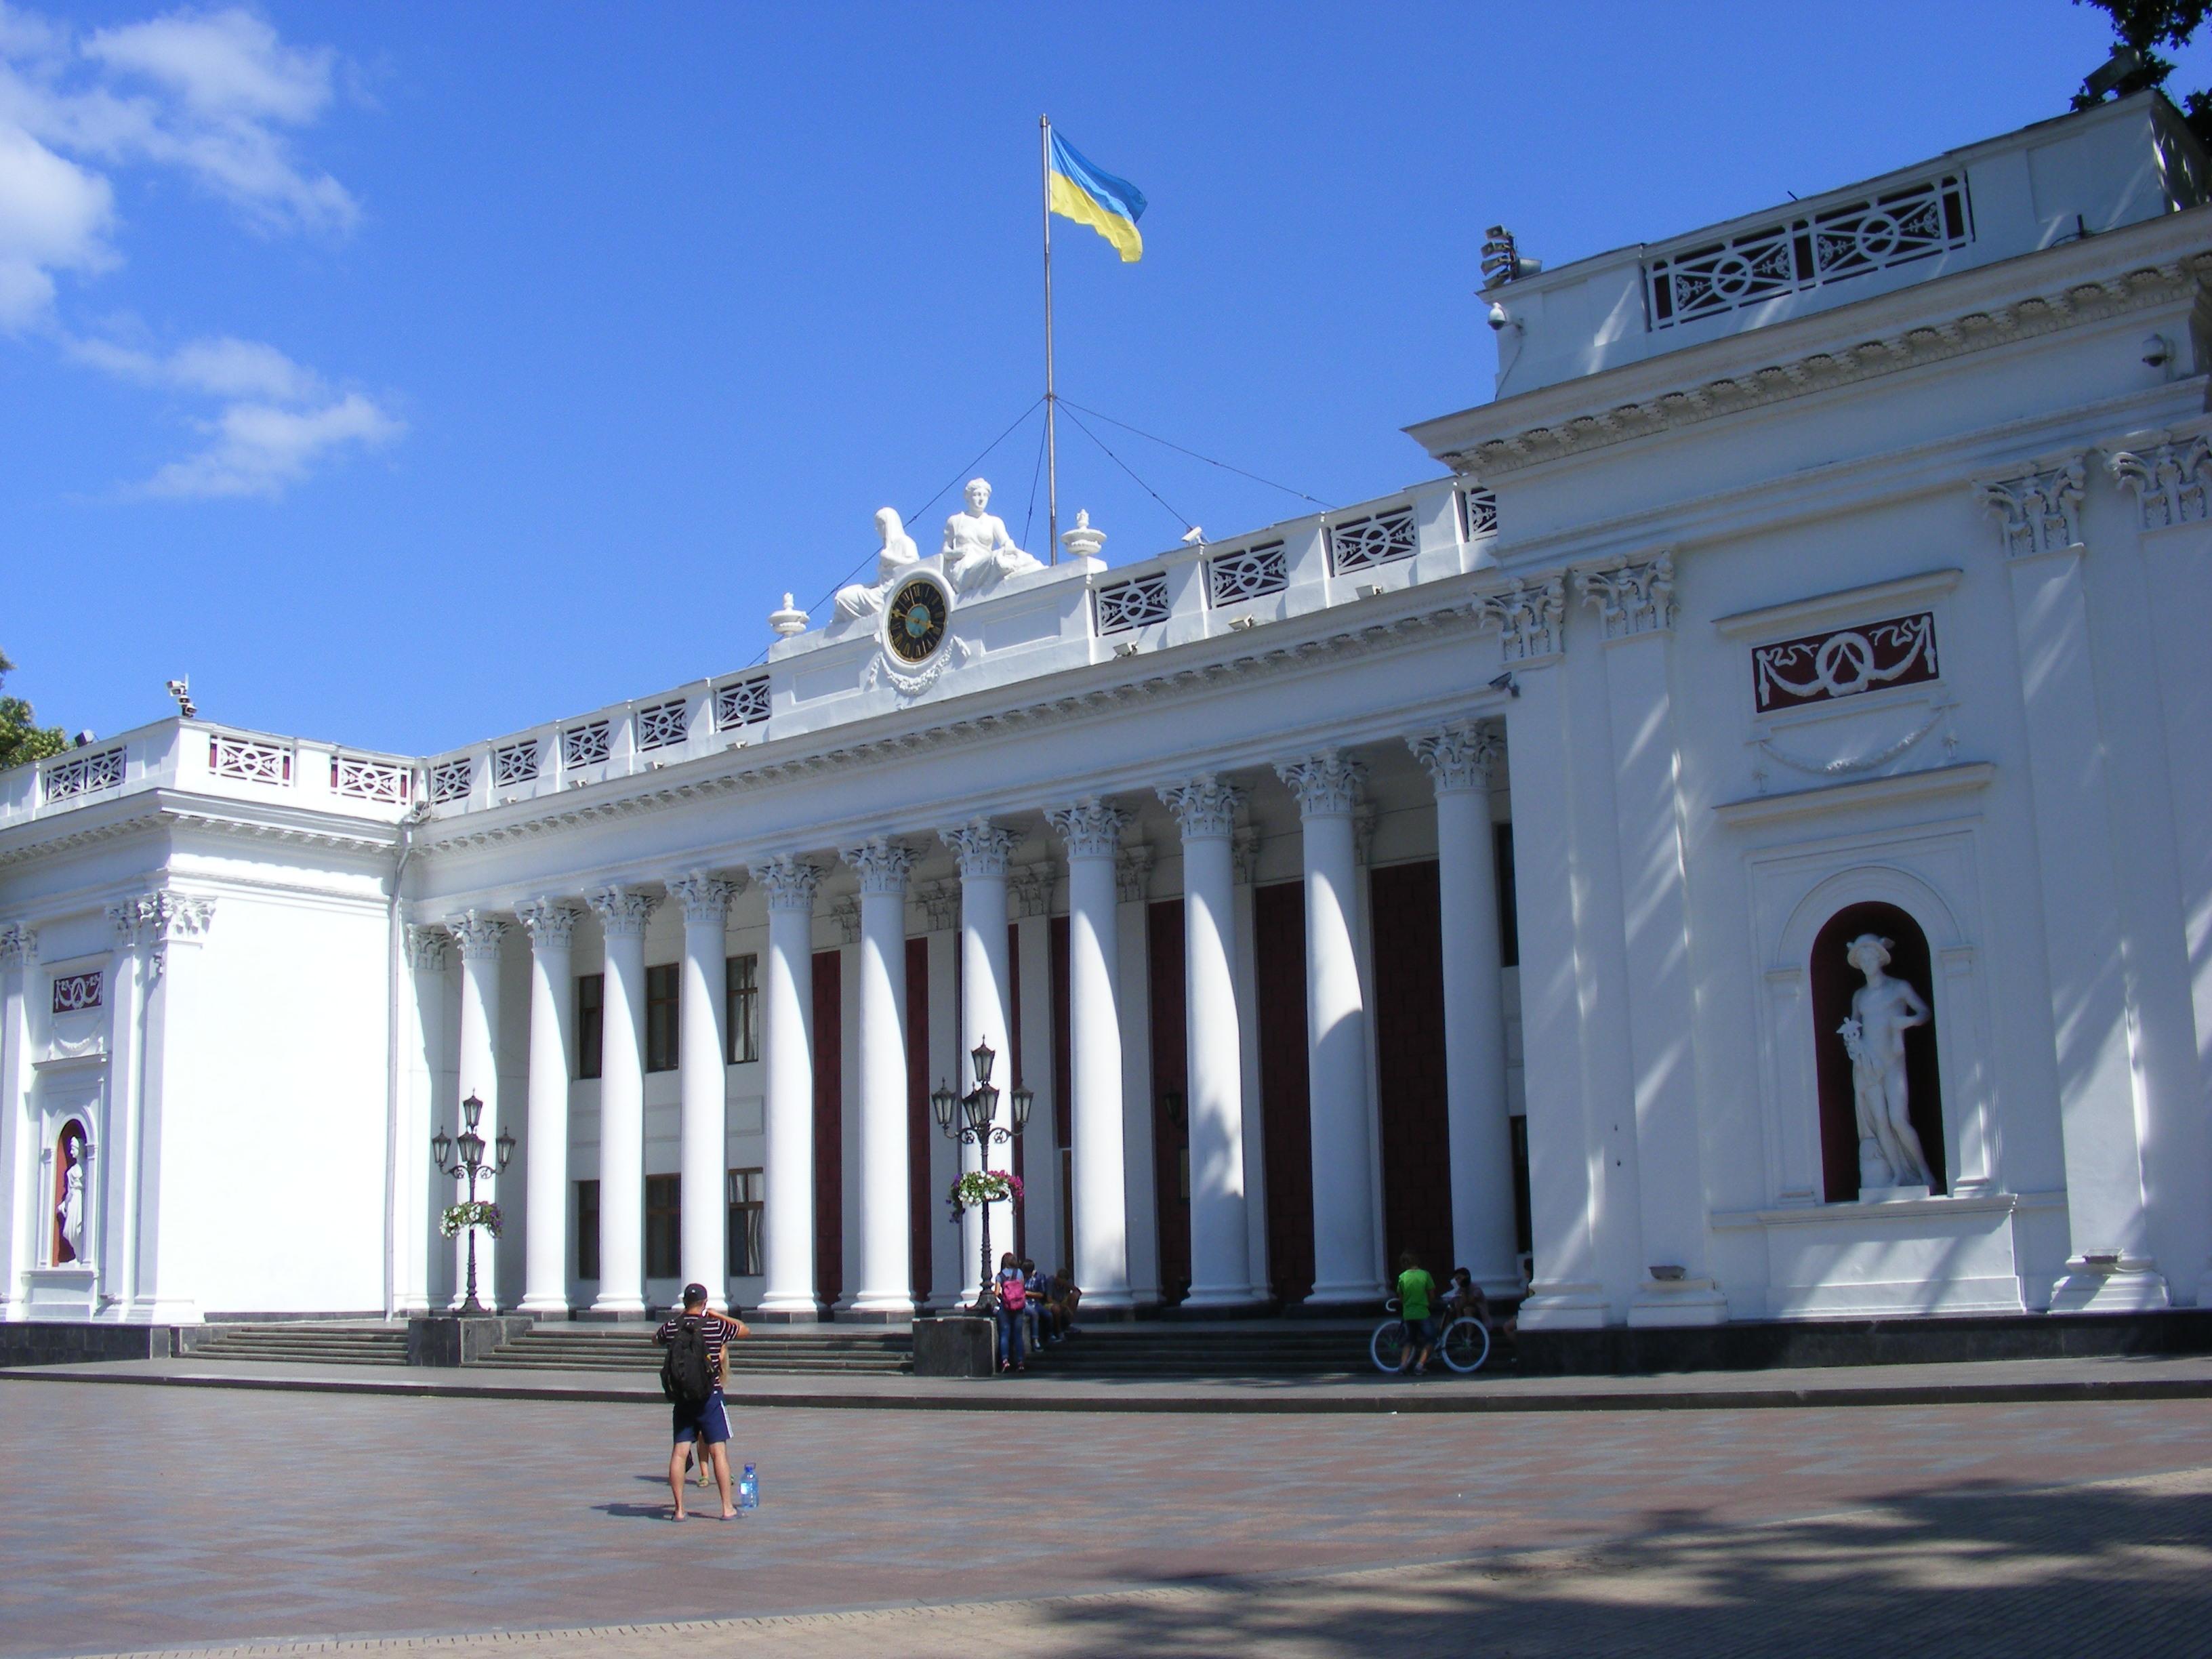 Ревизия обнаружила в Одесском горсовете нарушения на 3,5 миллиона гривен